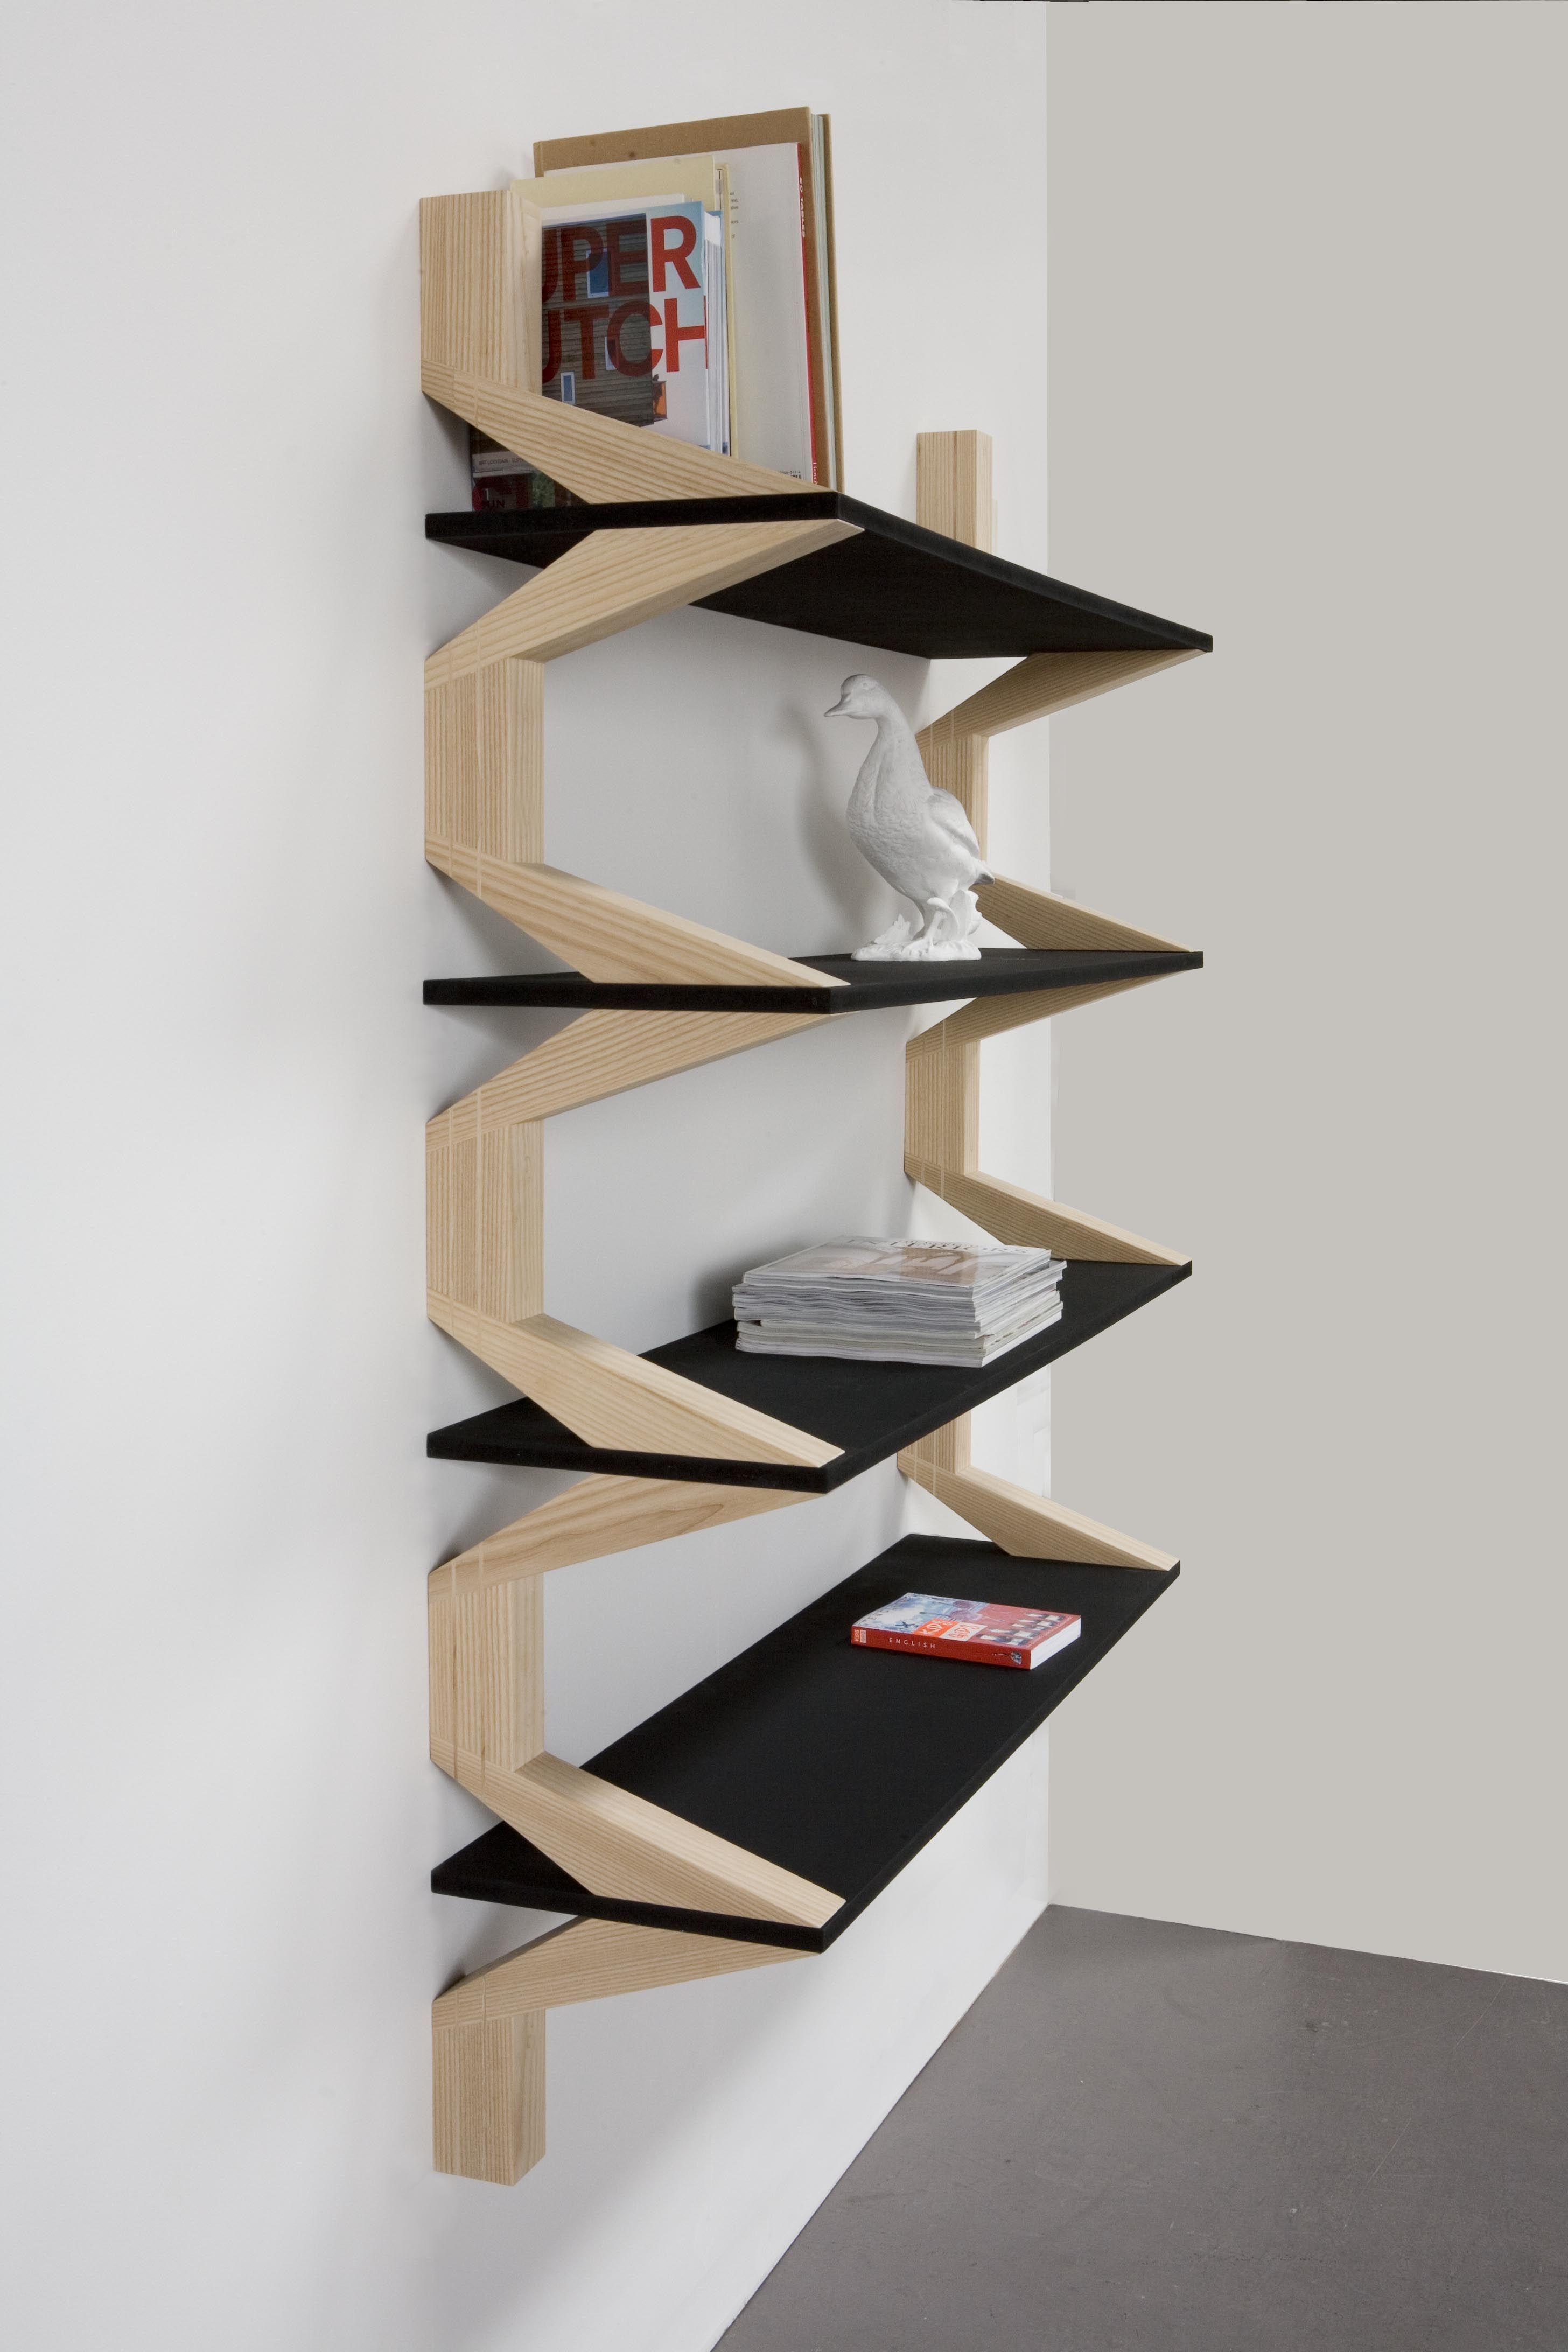 projects idea of corner wall shelving. Packman Shelves  by Arp CRIAN AS QUARTOS BRINCAR Pinterest